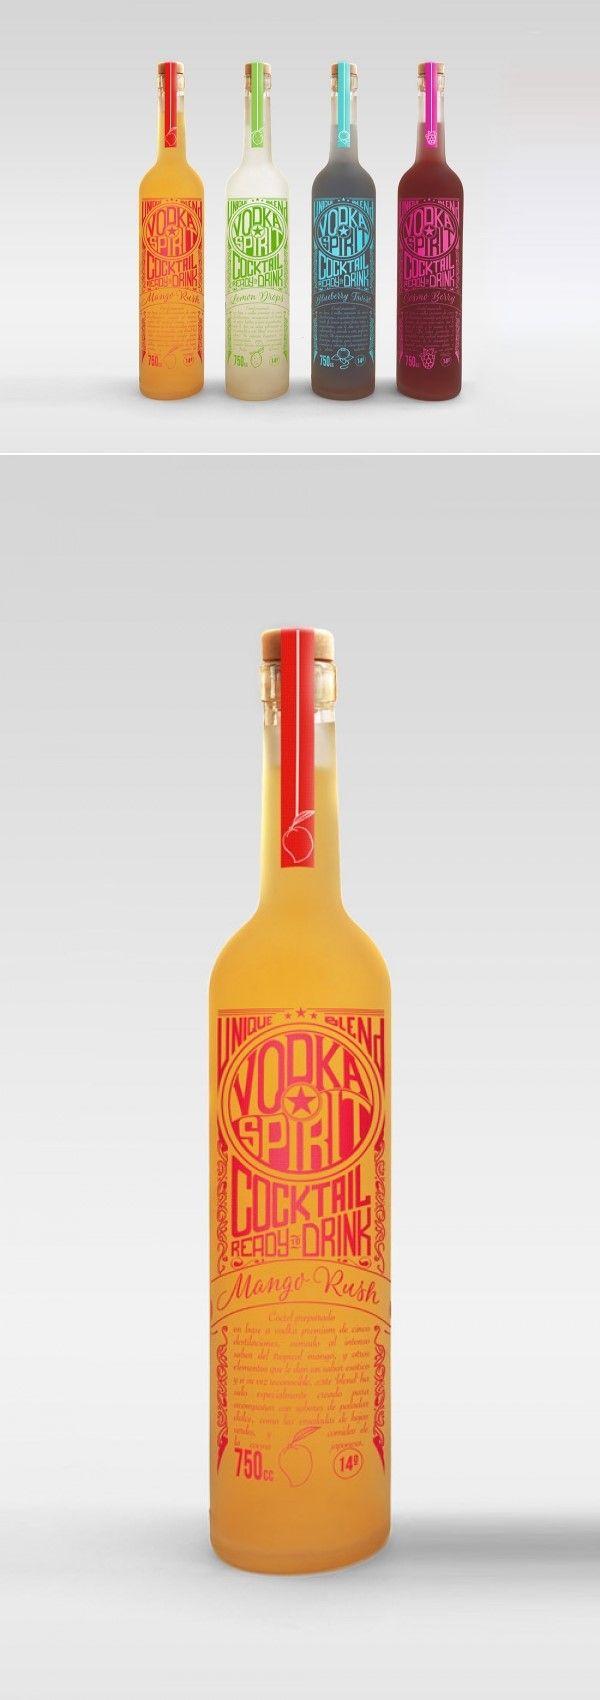 Vodka Spirit Packaging by Martin Merino Ronda